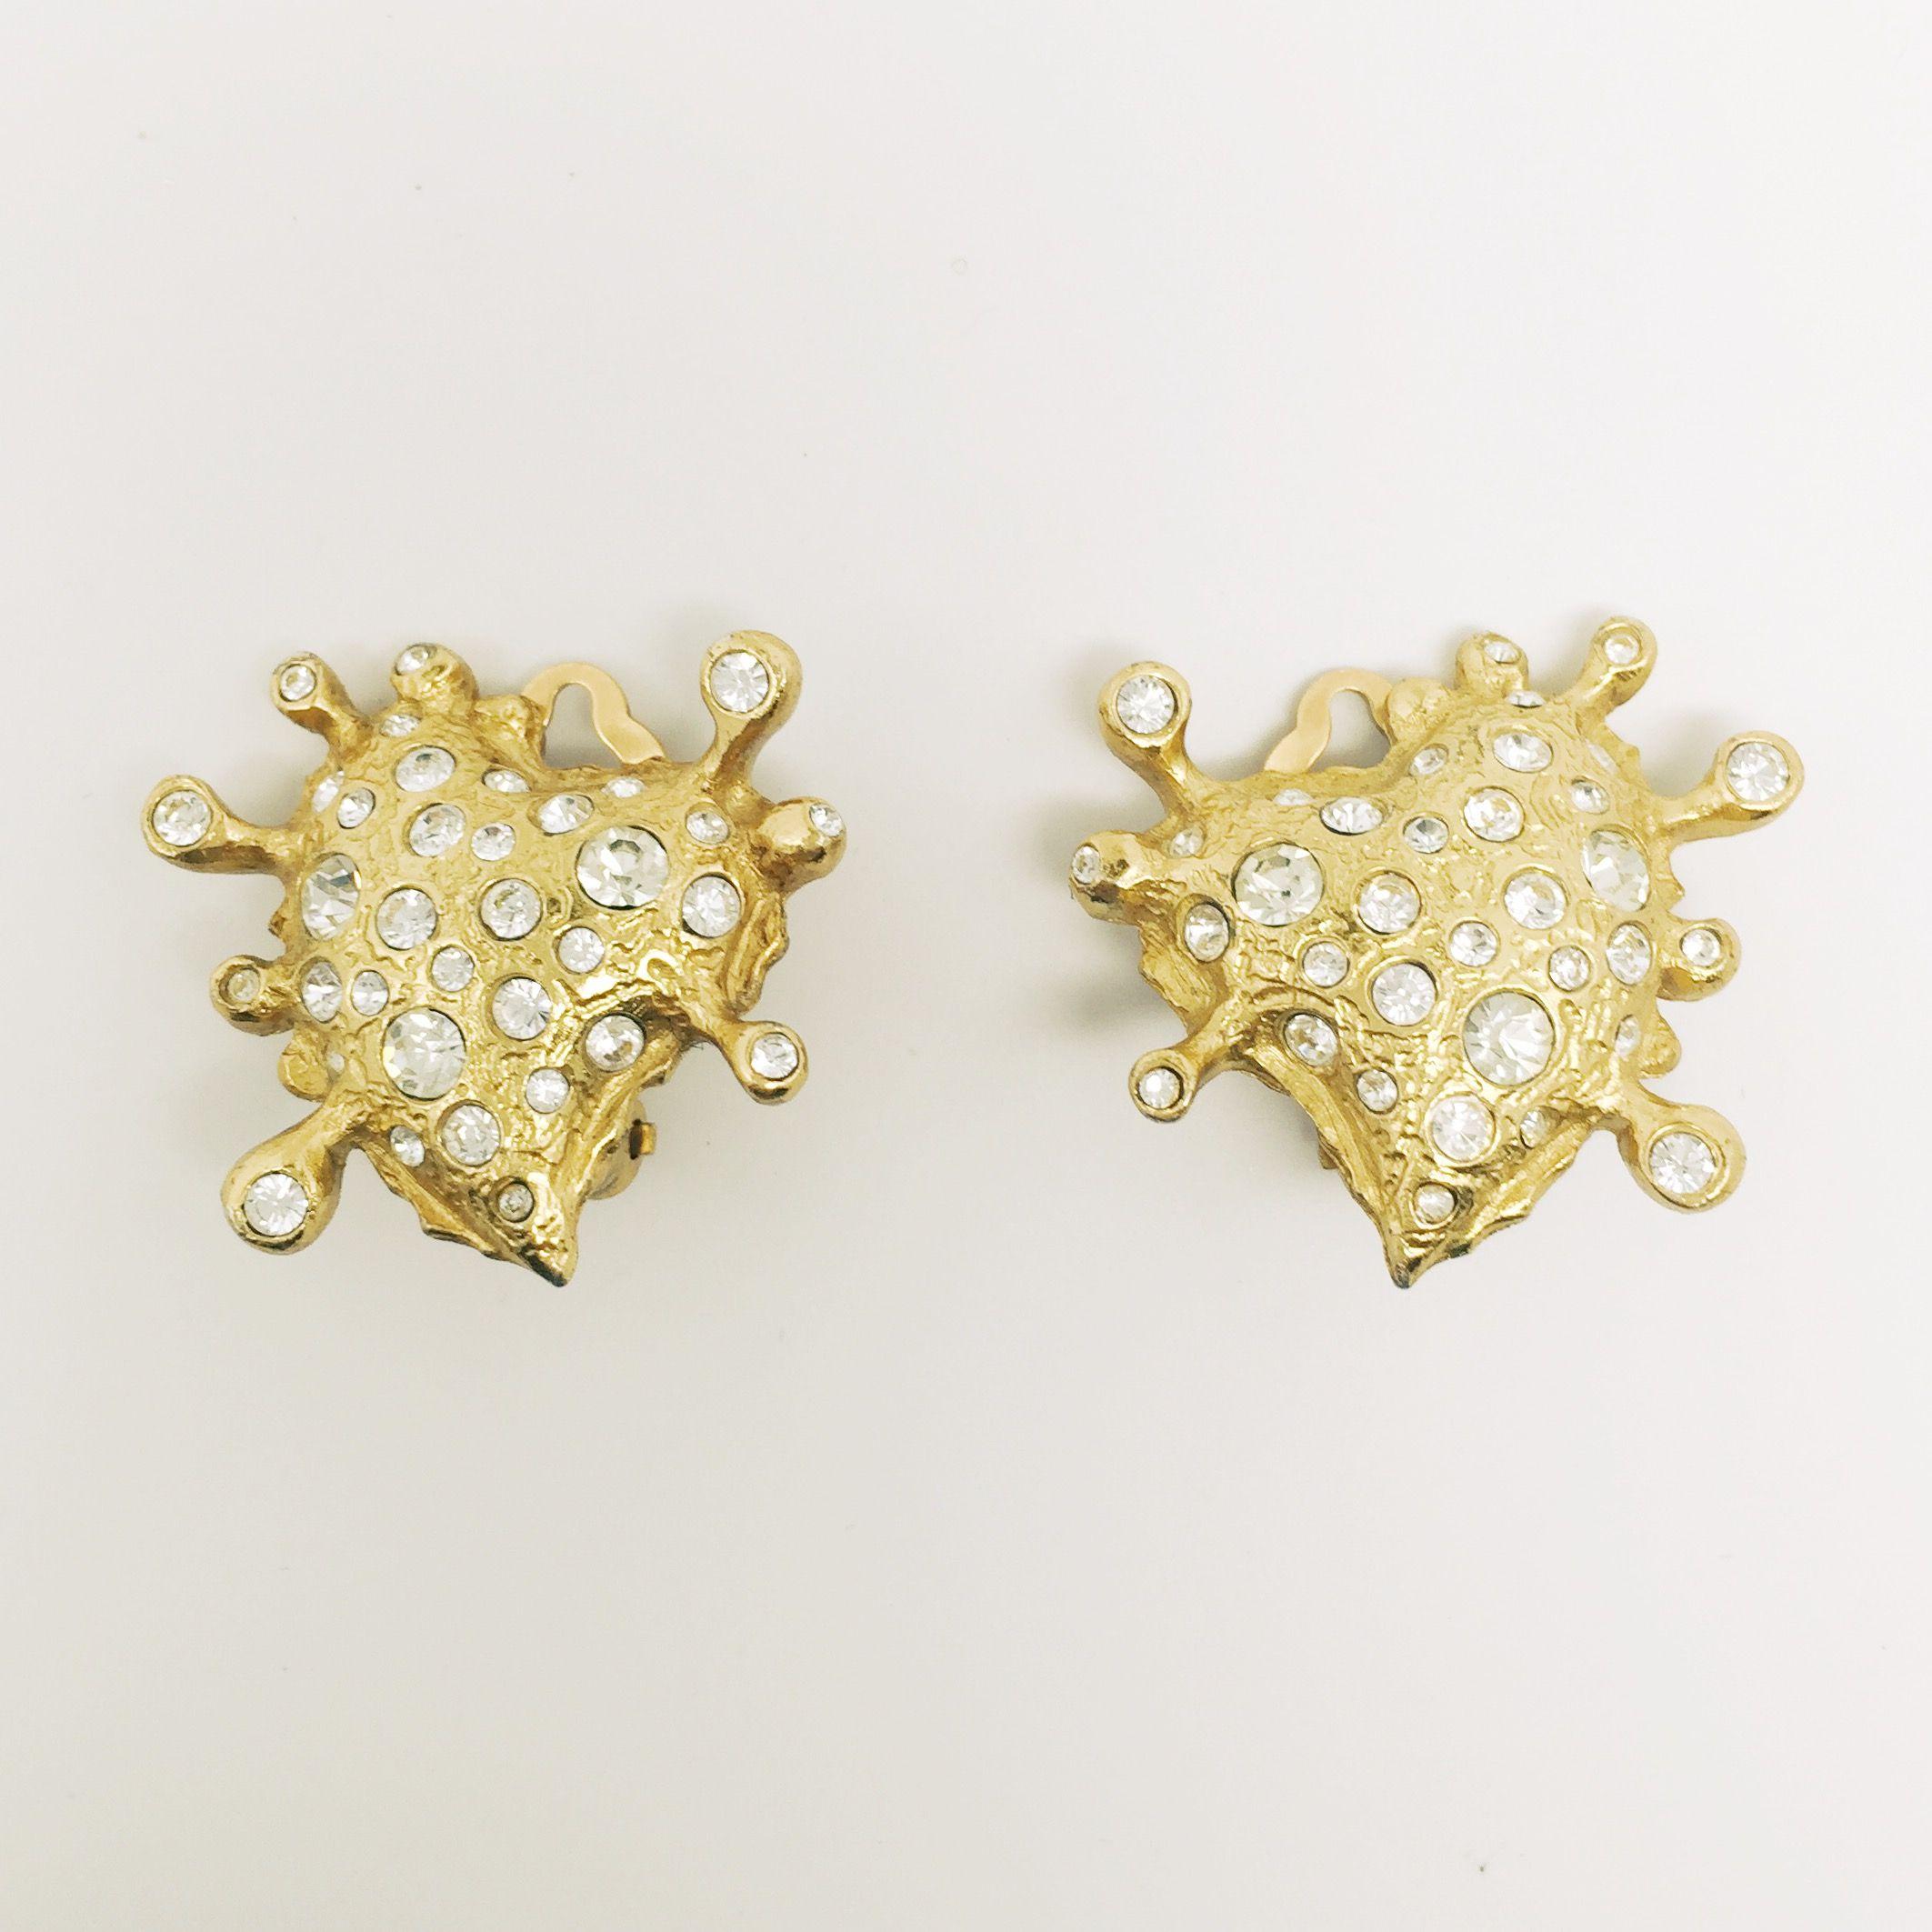 Vintage jewelry designs